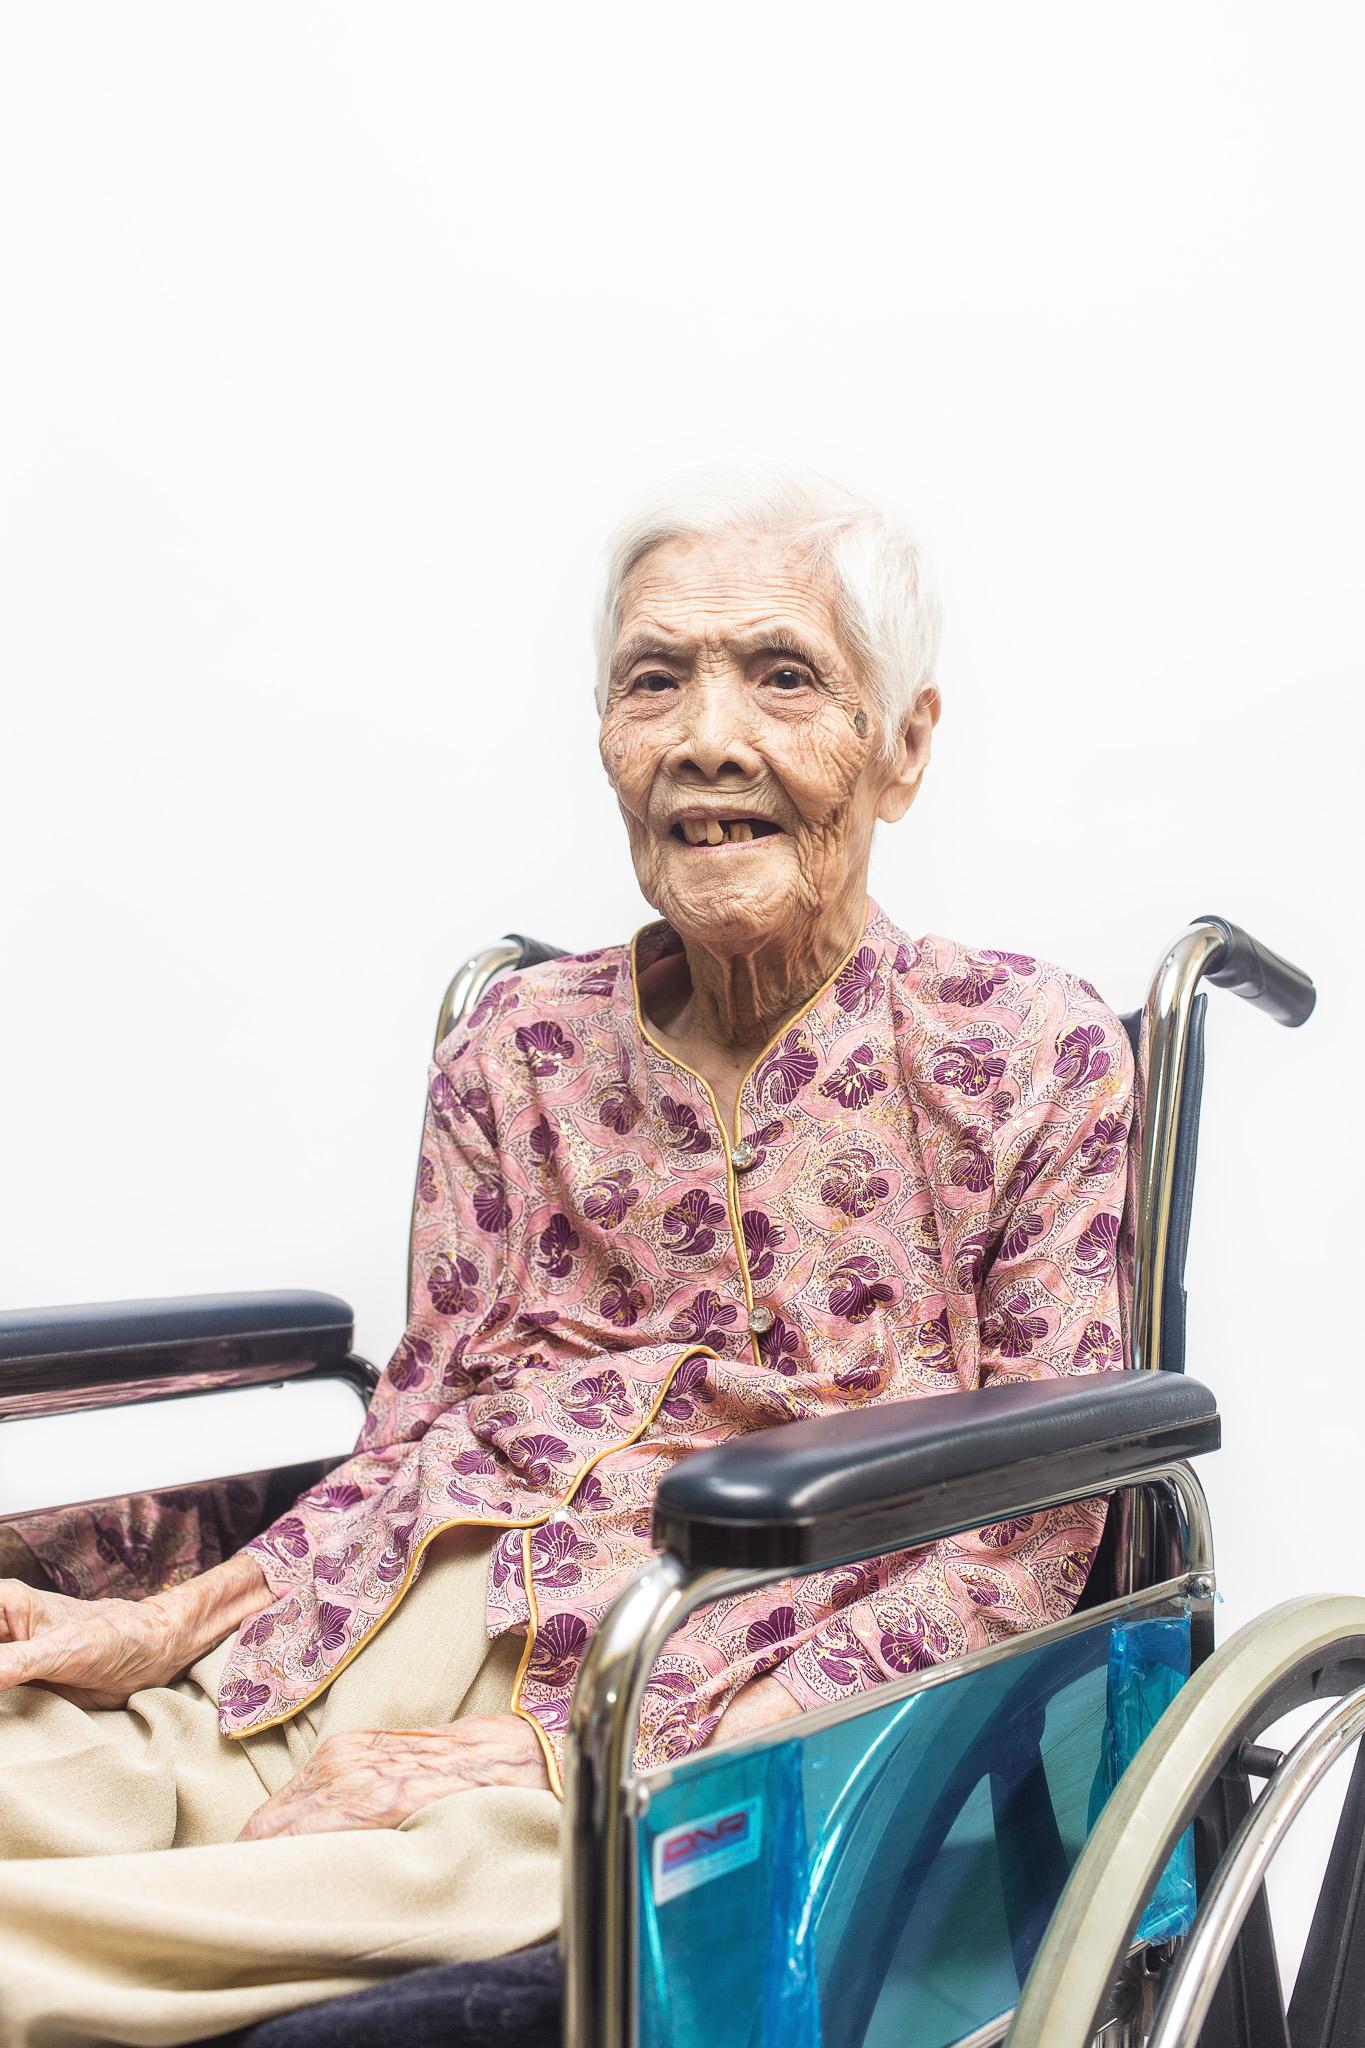 zainal-zainal-studio-centenarians-care-duke-nus-singapore-photographer-16.jpg